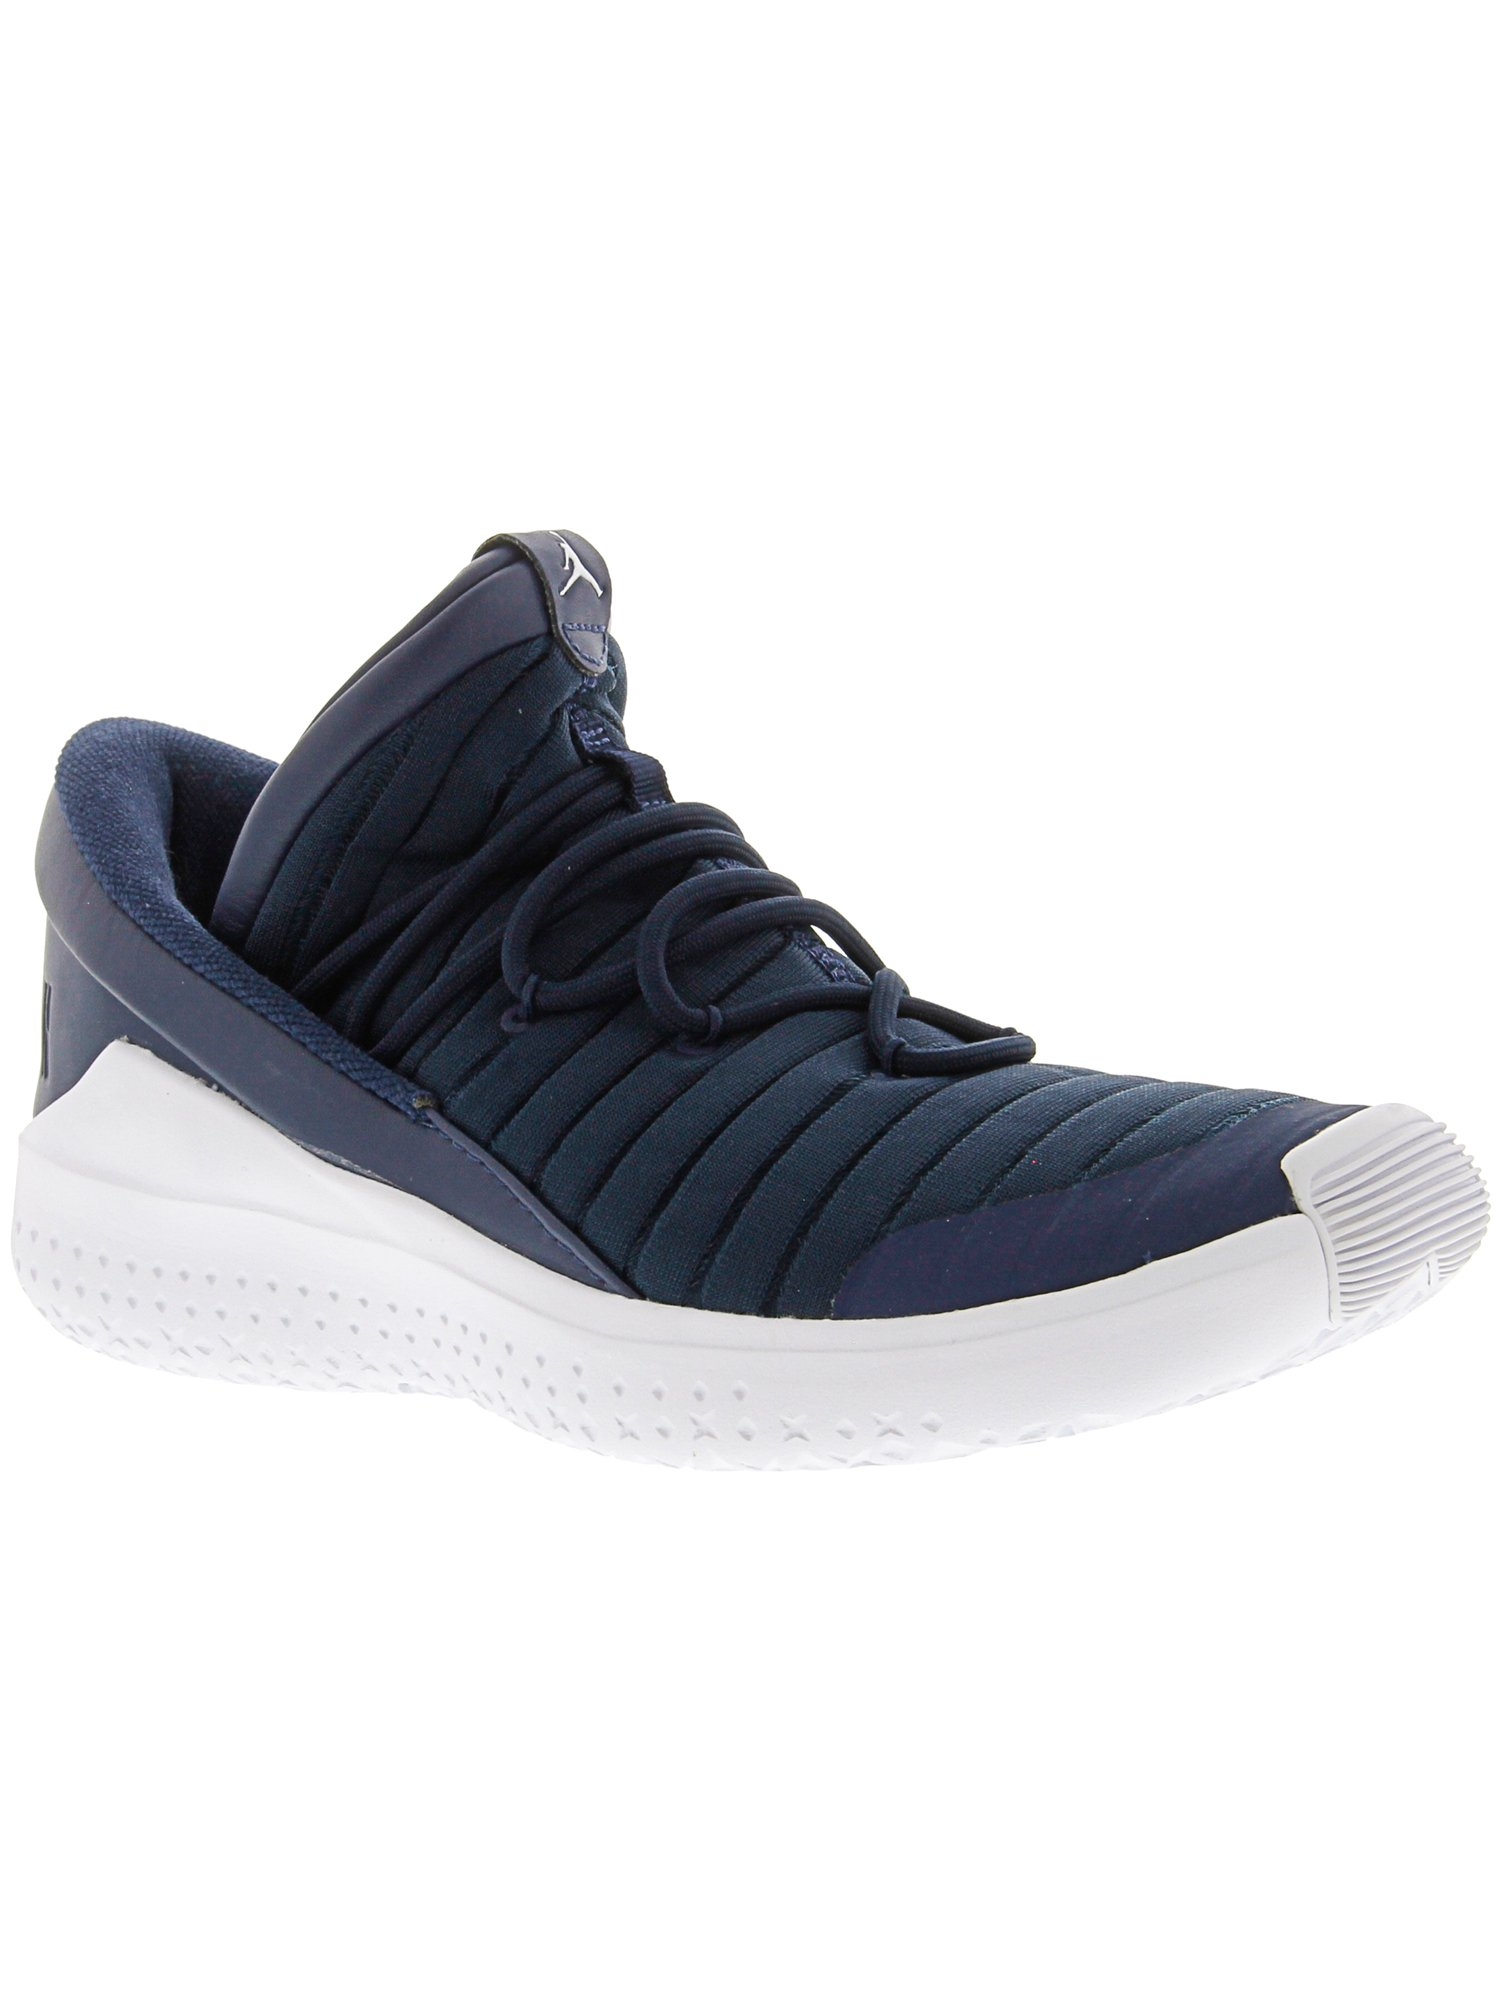 online retailer ab4b8 efb52 Nike Men s Jordan Flight Luxe Midnight Navy   White - Ankle-High Fabric  Basketball Shoe 8M